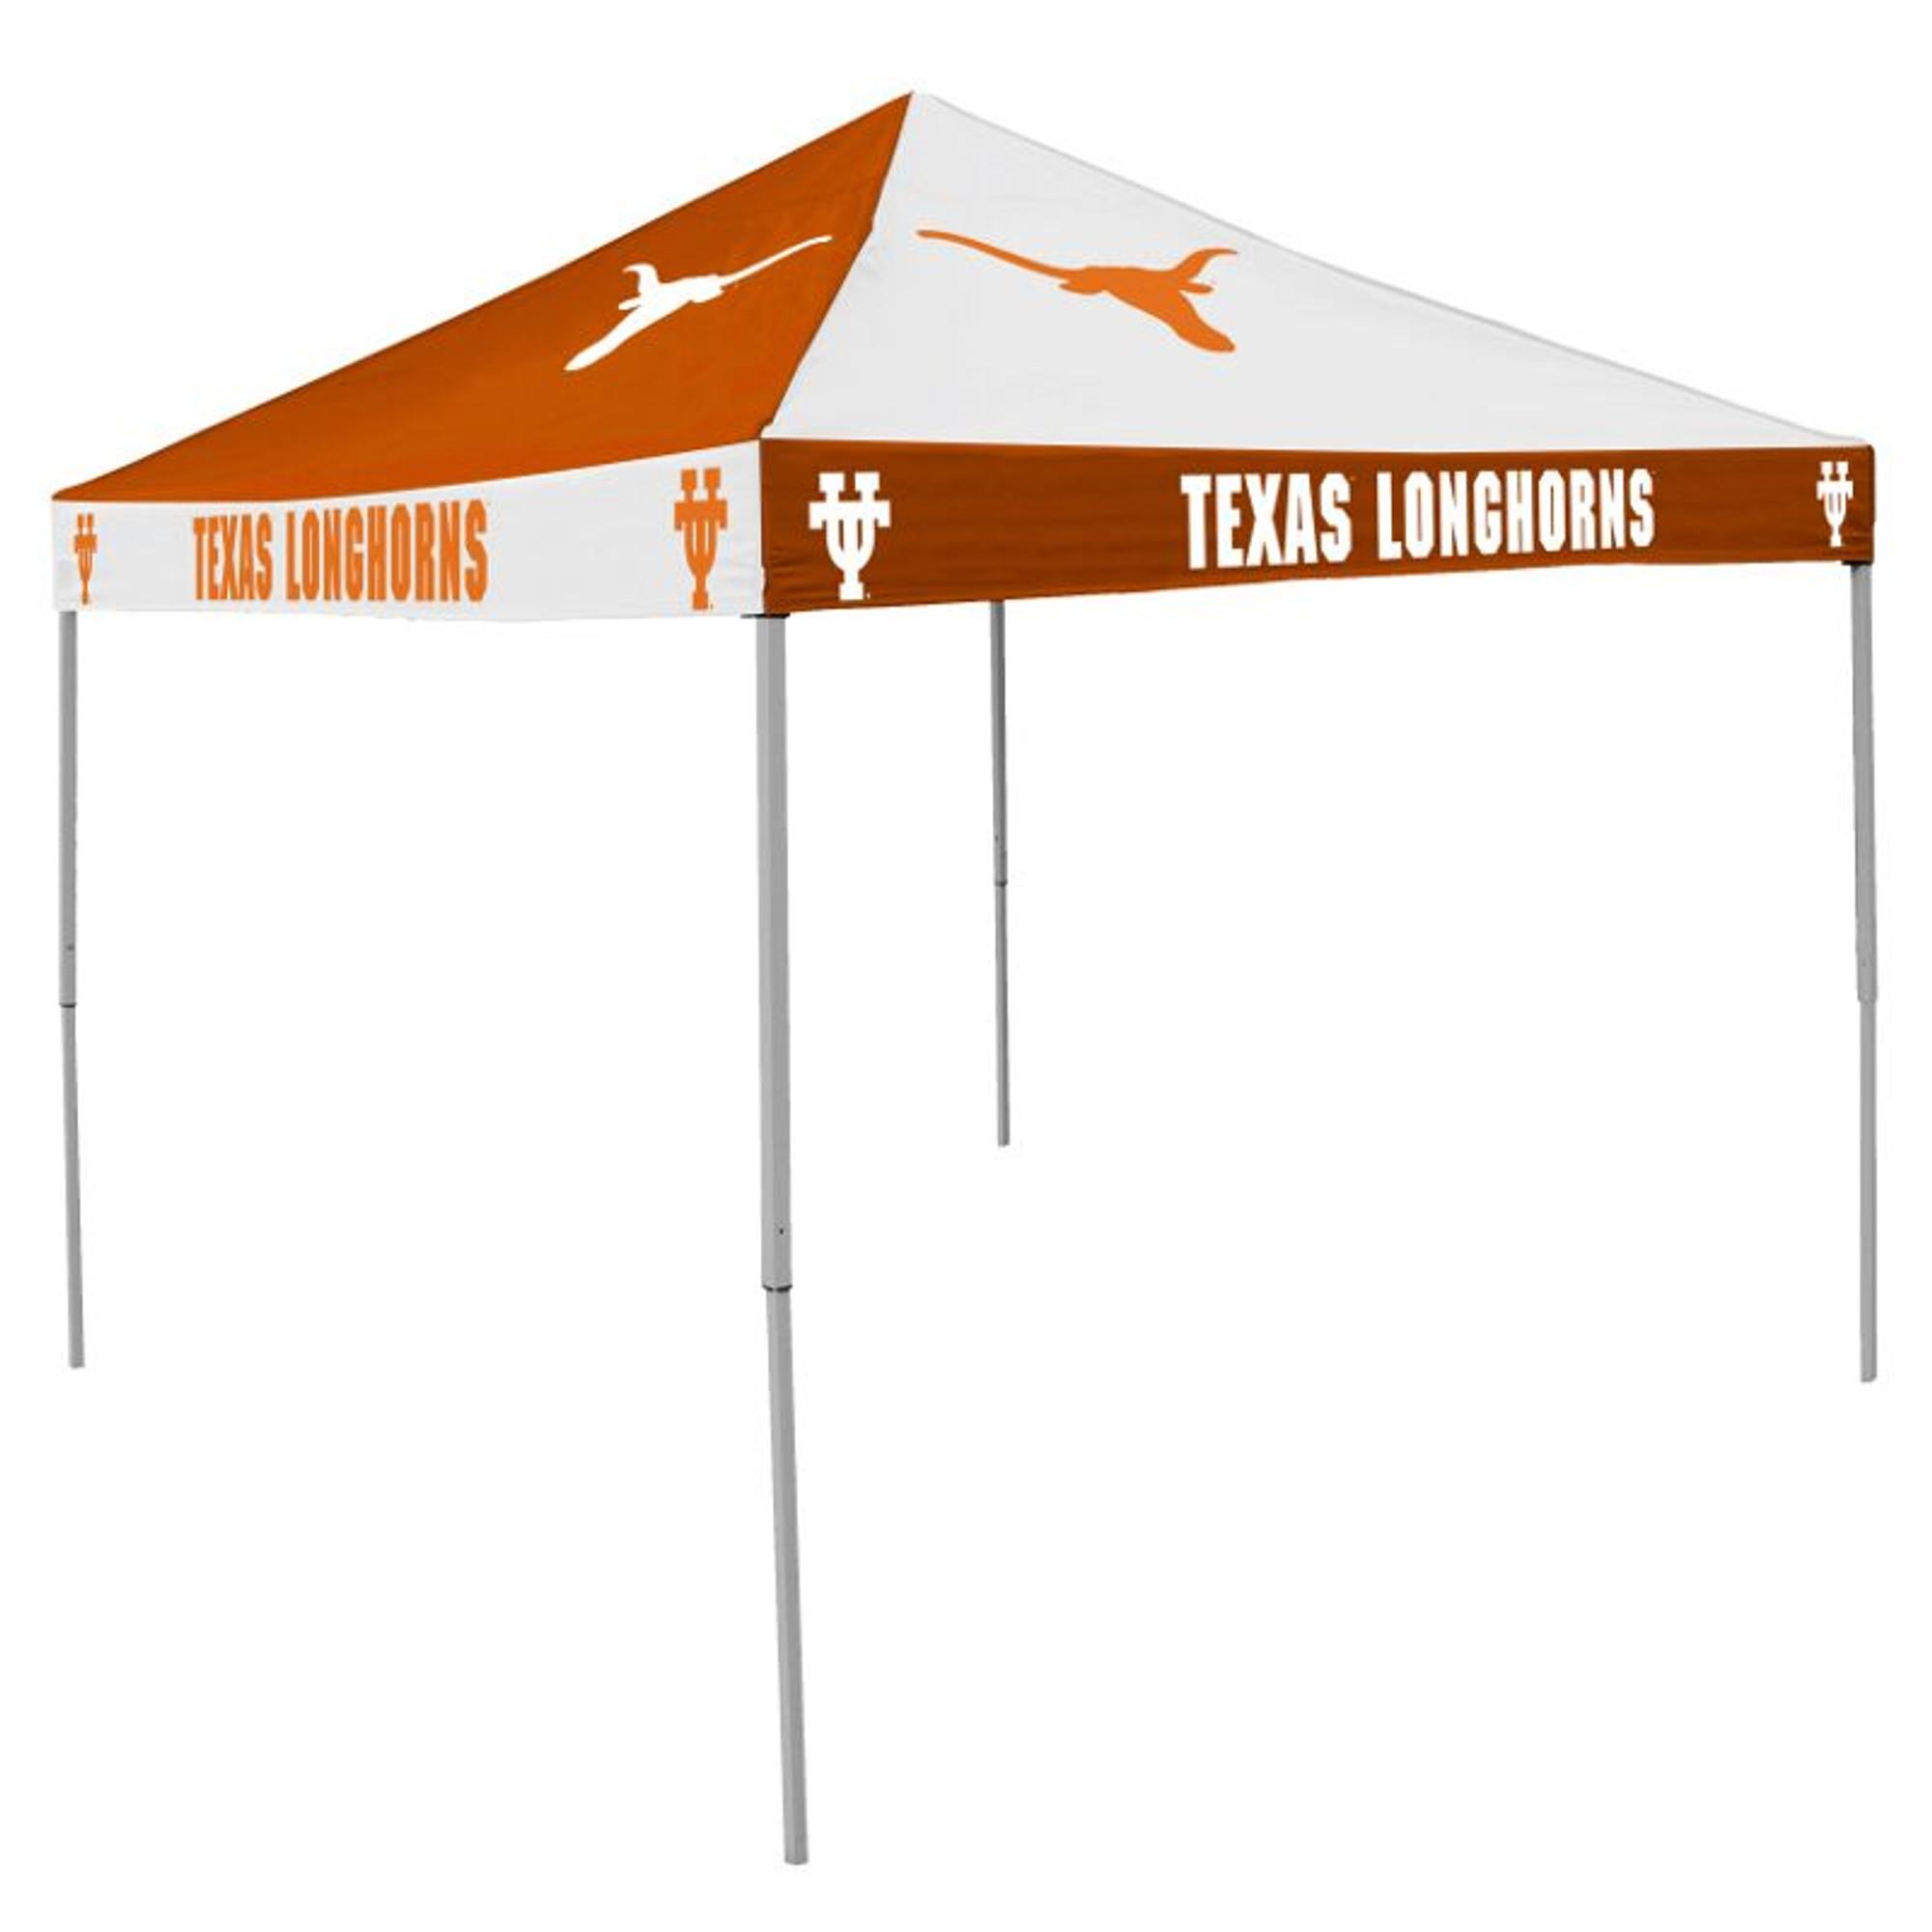 Texas Longhorns Tailgate Tent